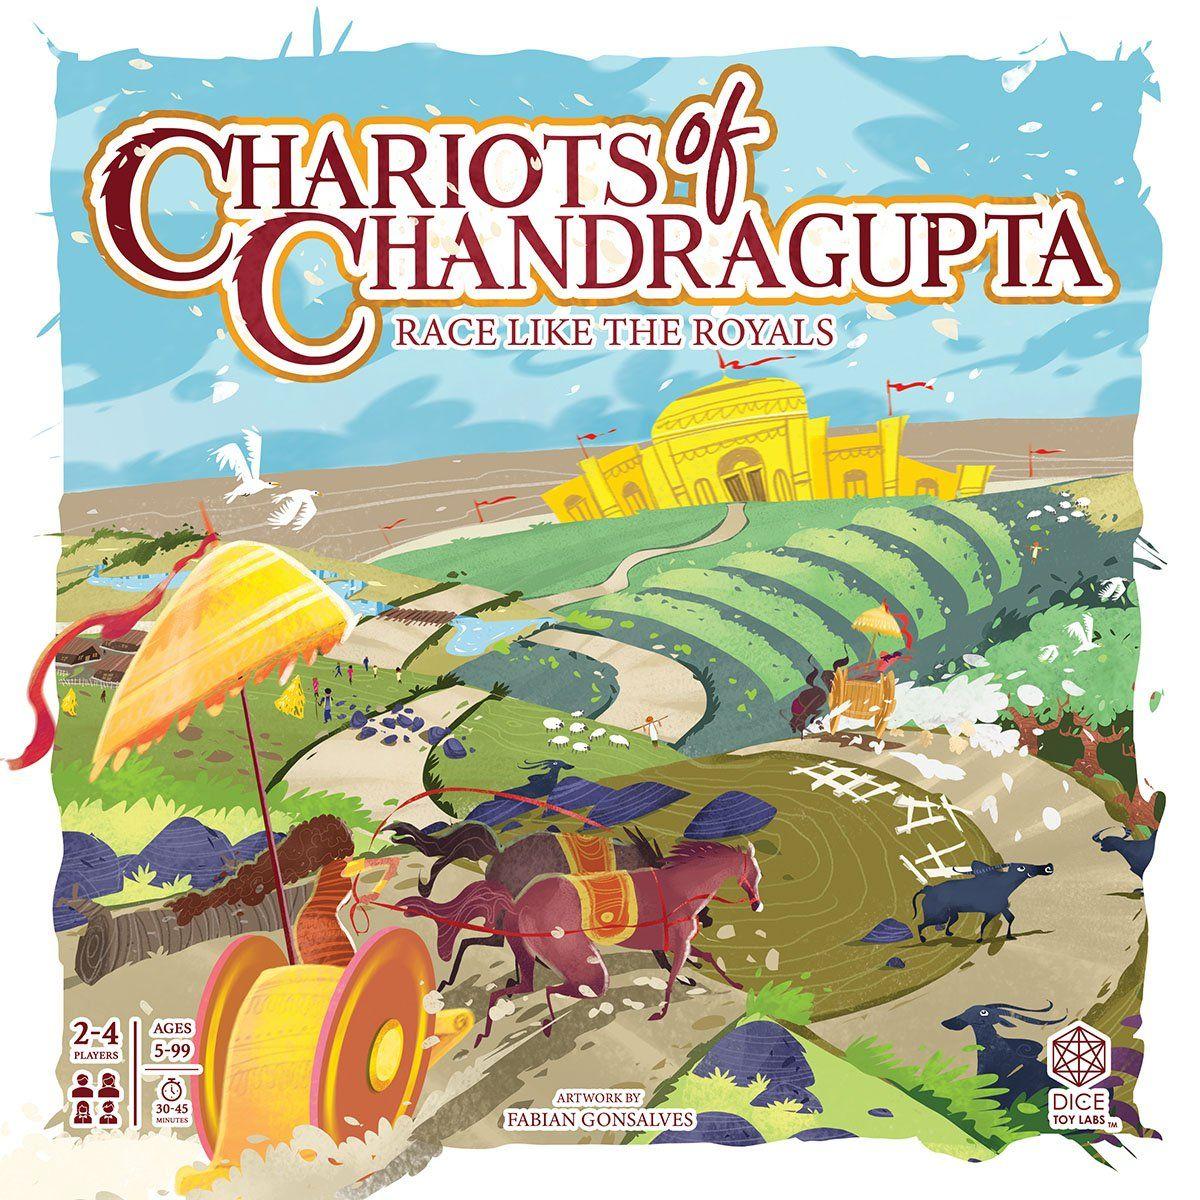 Chariots of Chandragupta